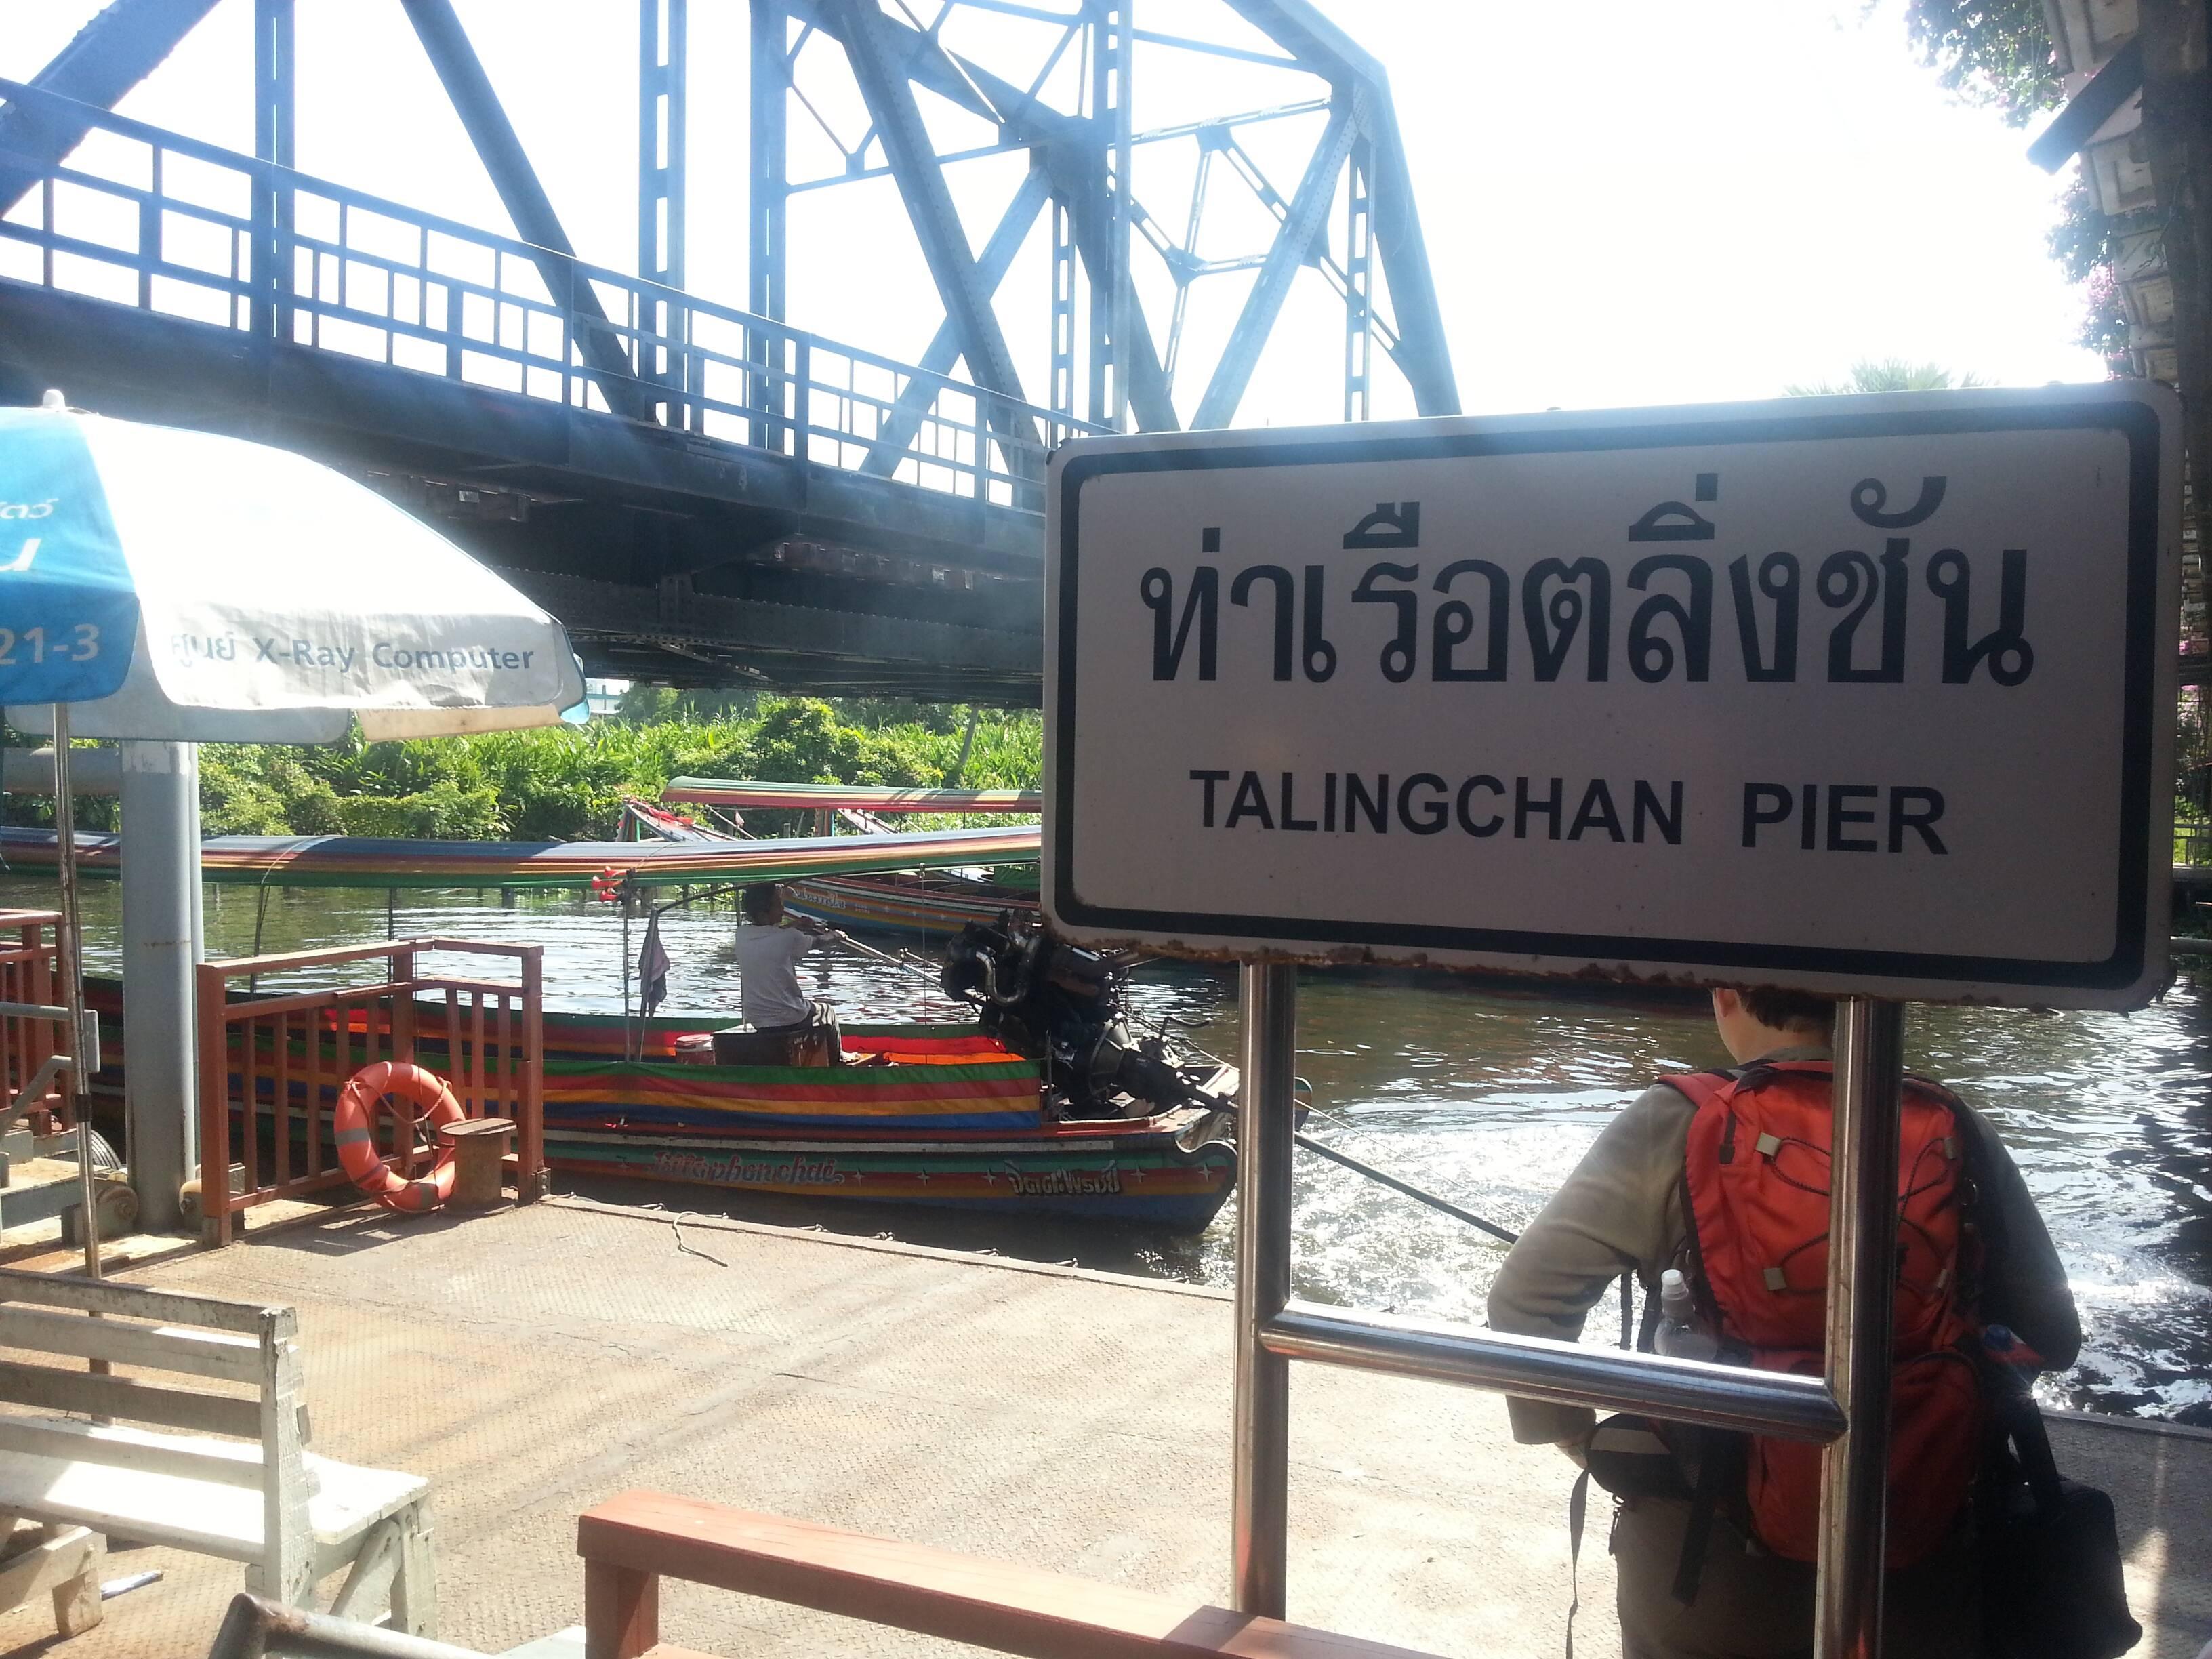 Píer de onde saem os longtail boats para os outros mercados e vilarejos